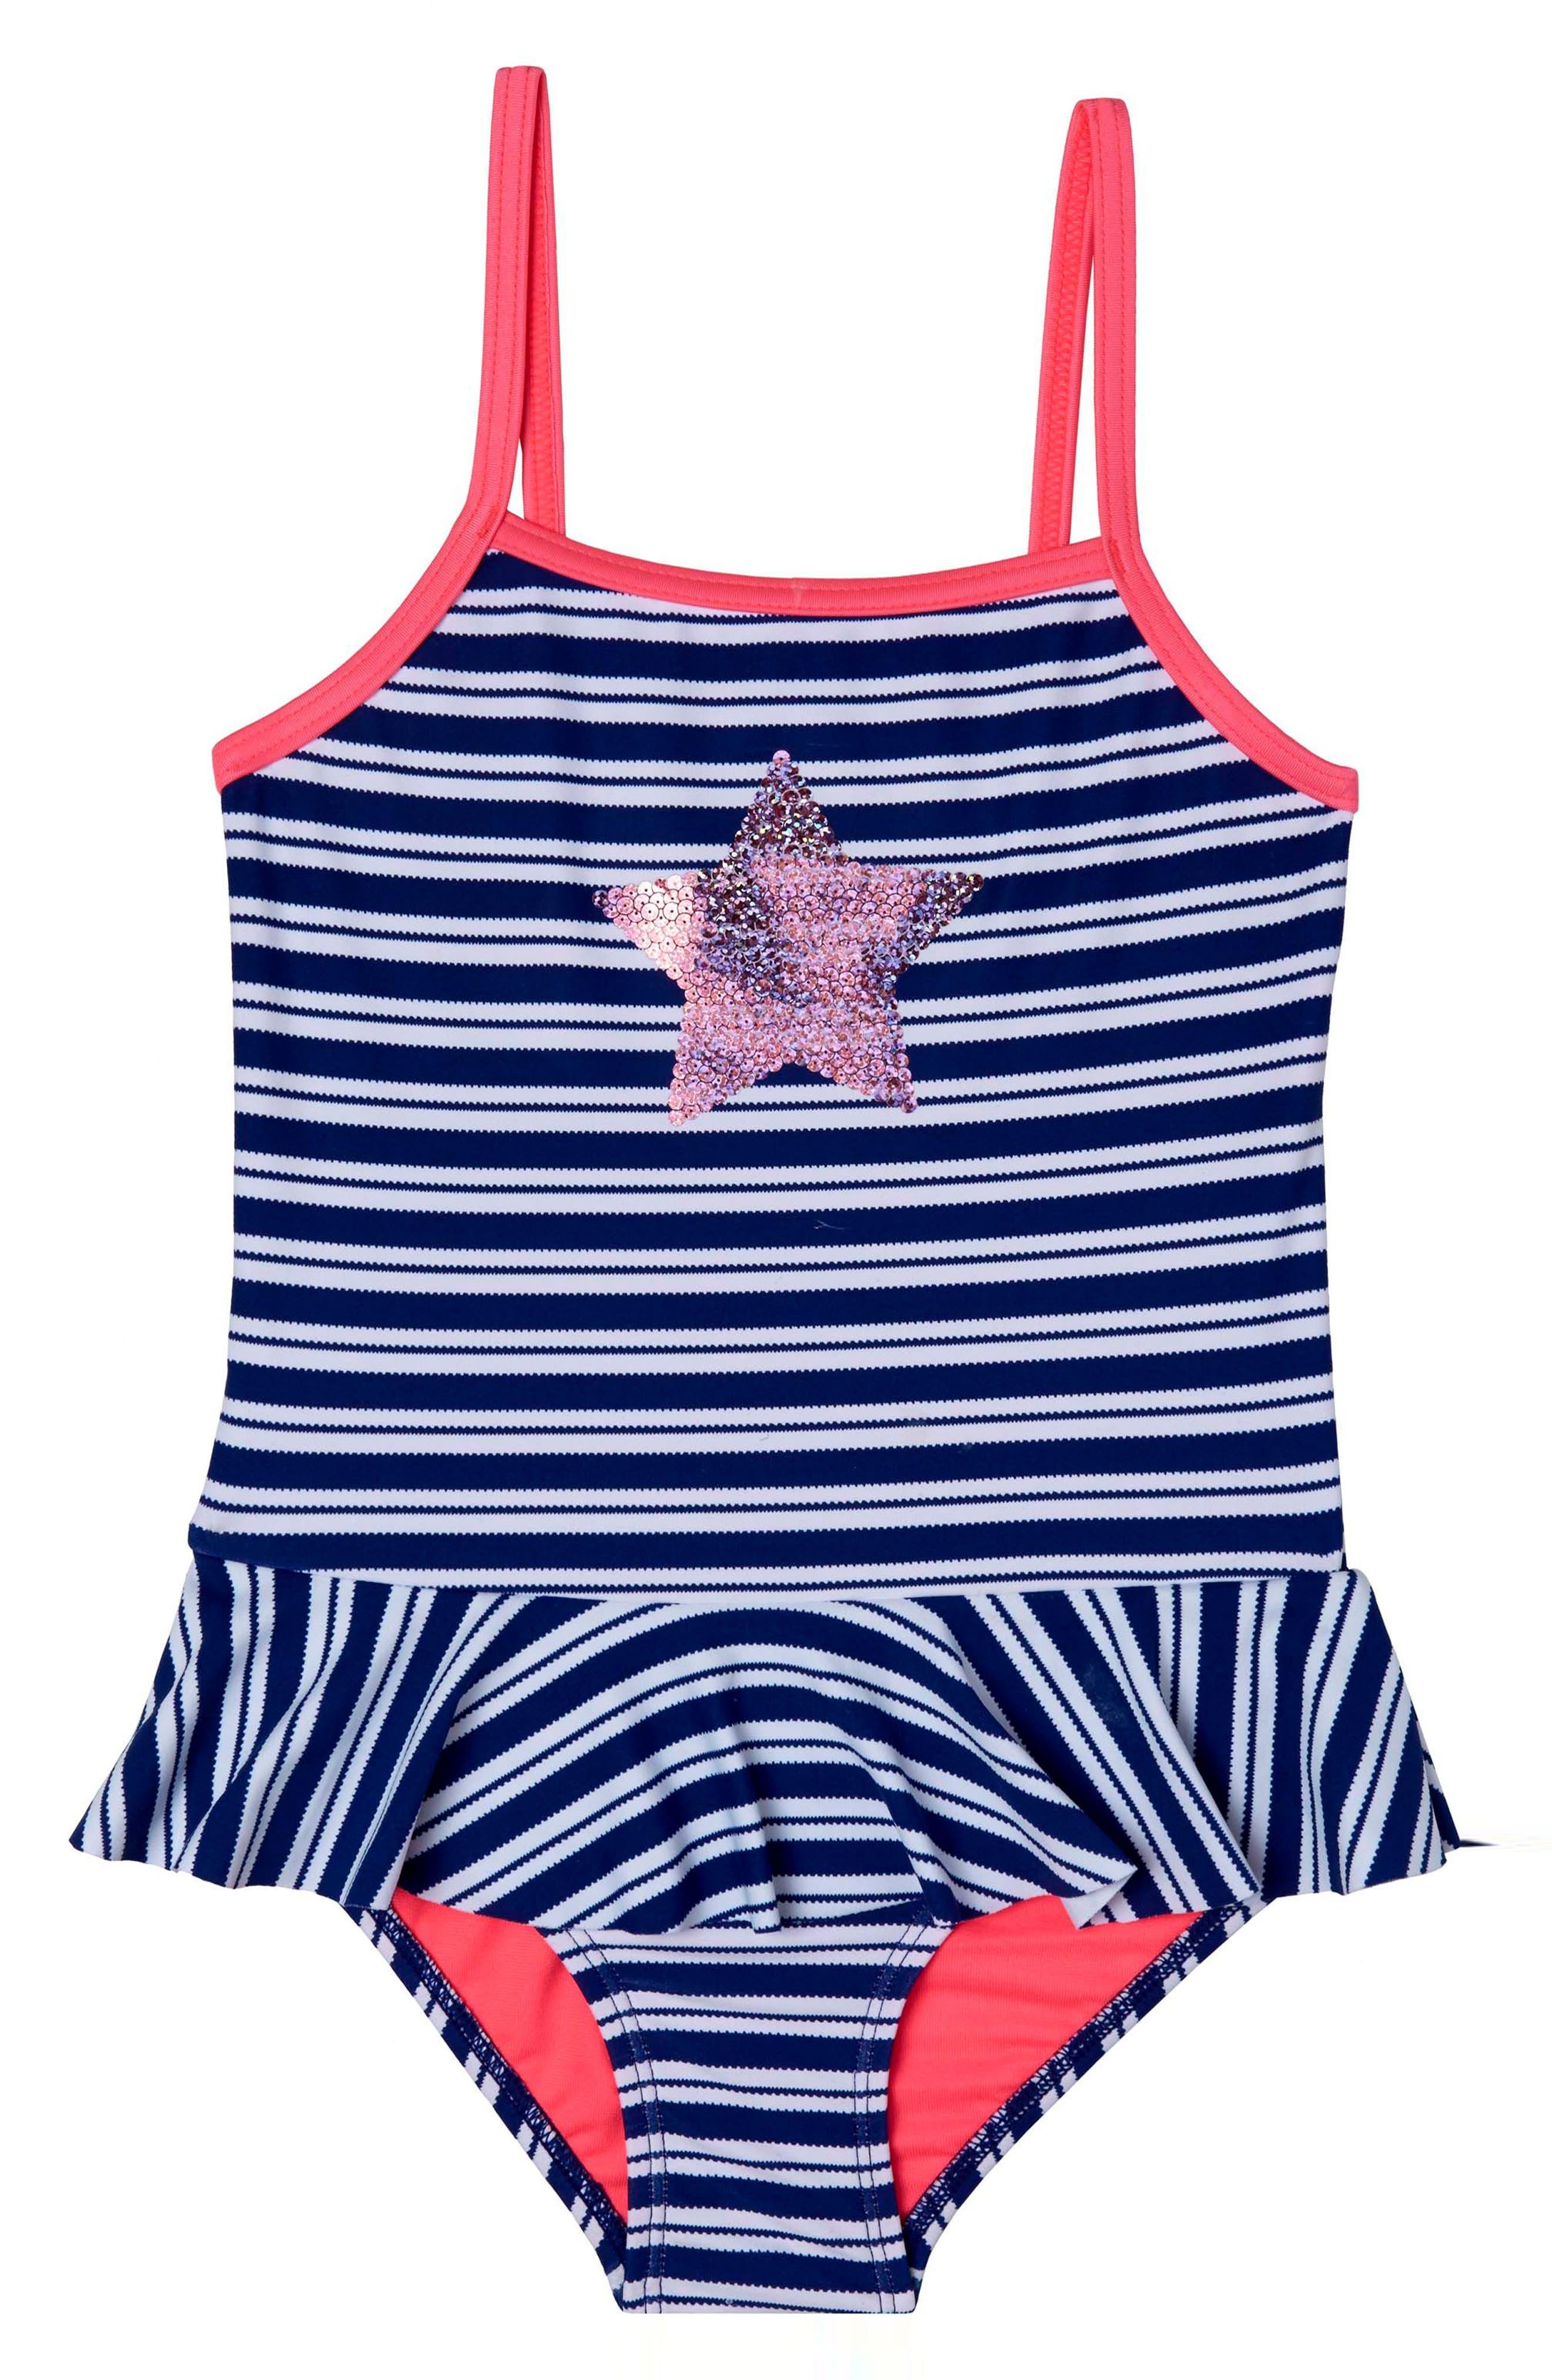 Alternate Image 1 Selected - Hula Star Retro Stripe One-Piece Swimsuit (Toddler Girls & Little Girls)